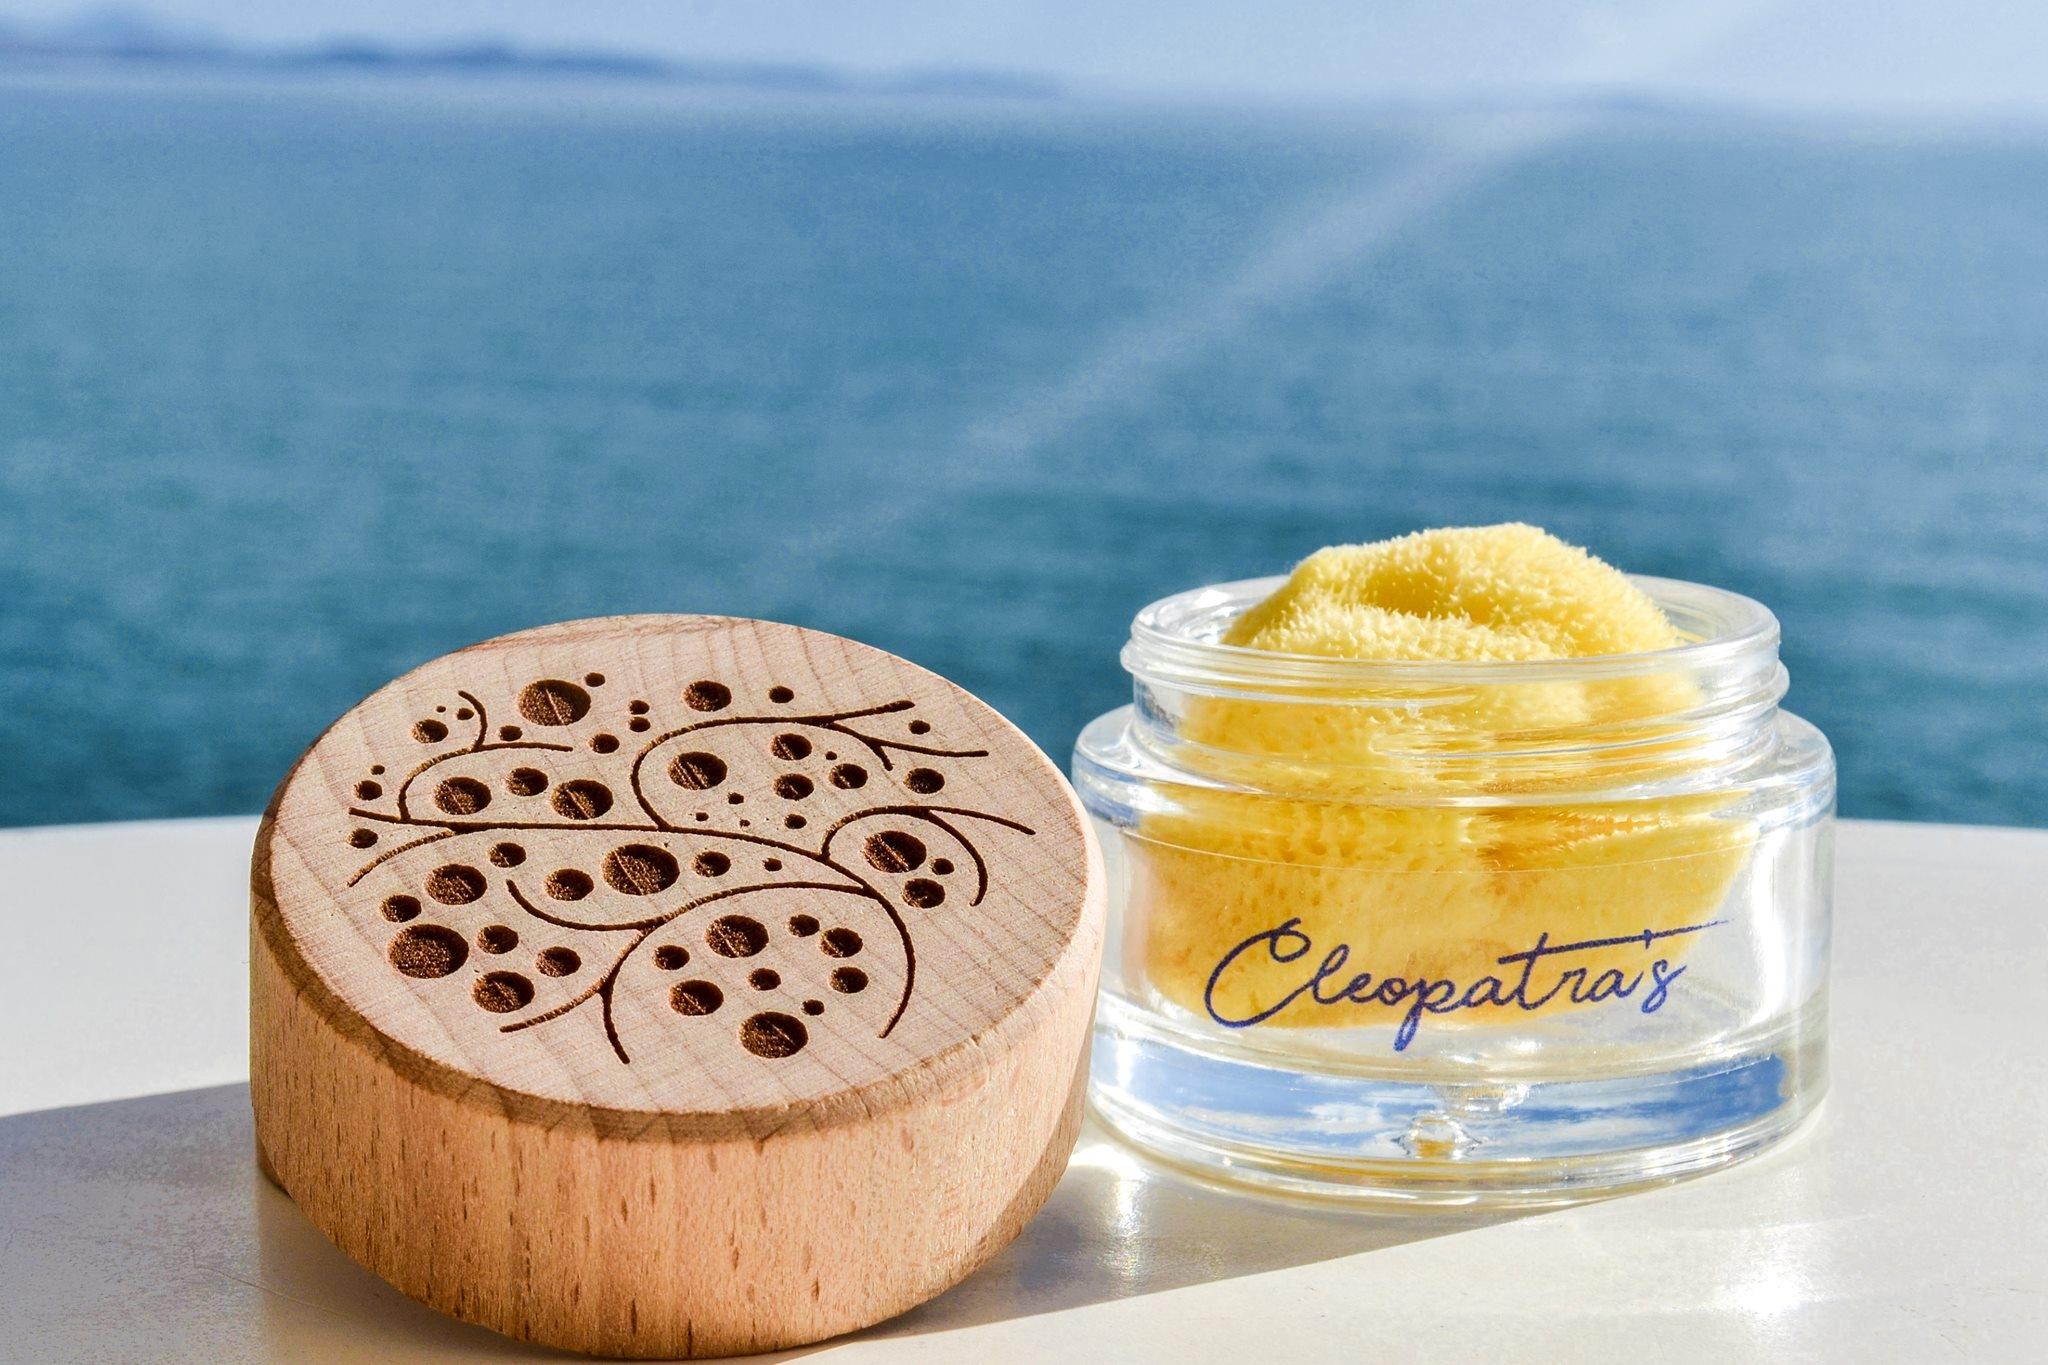 Cleopatra's Sponges